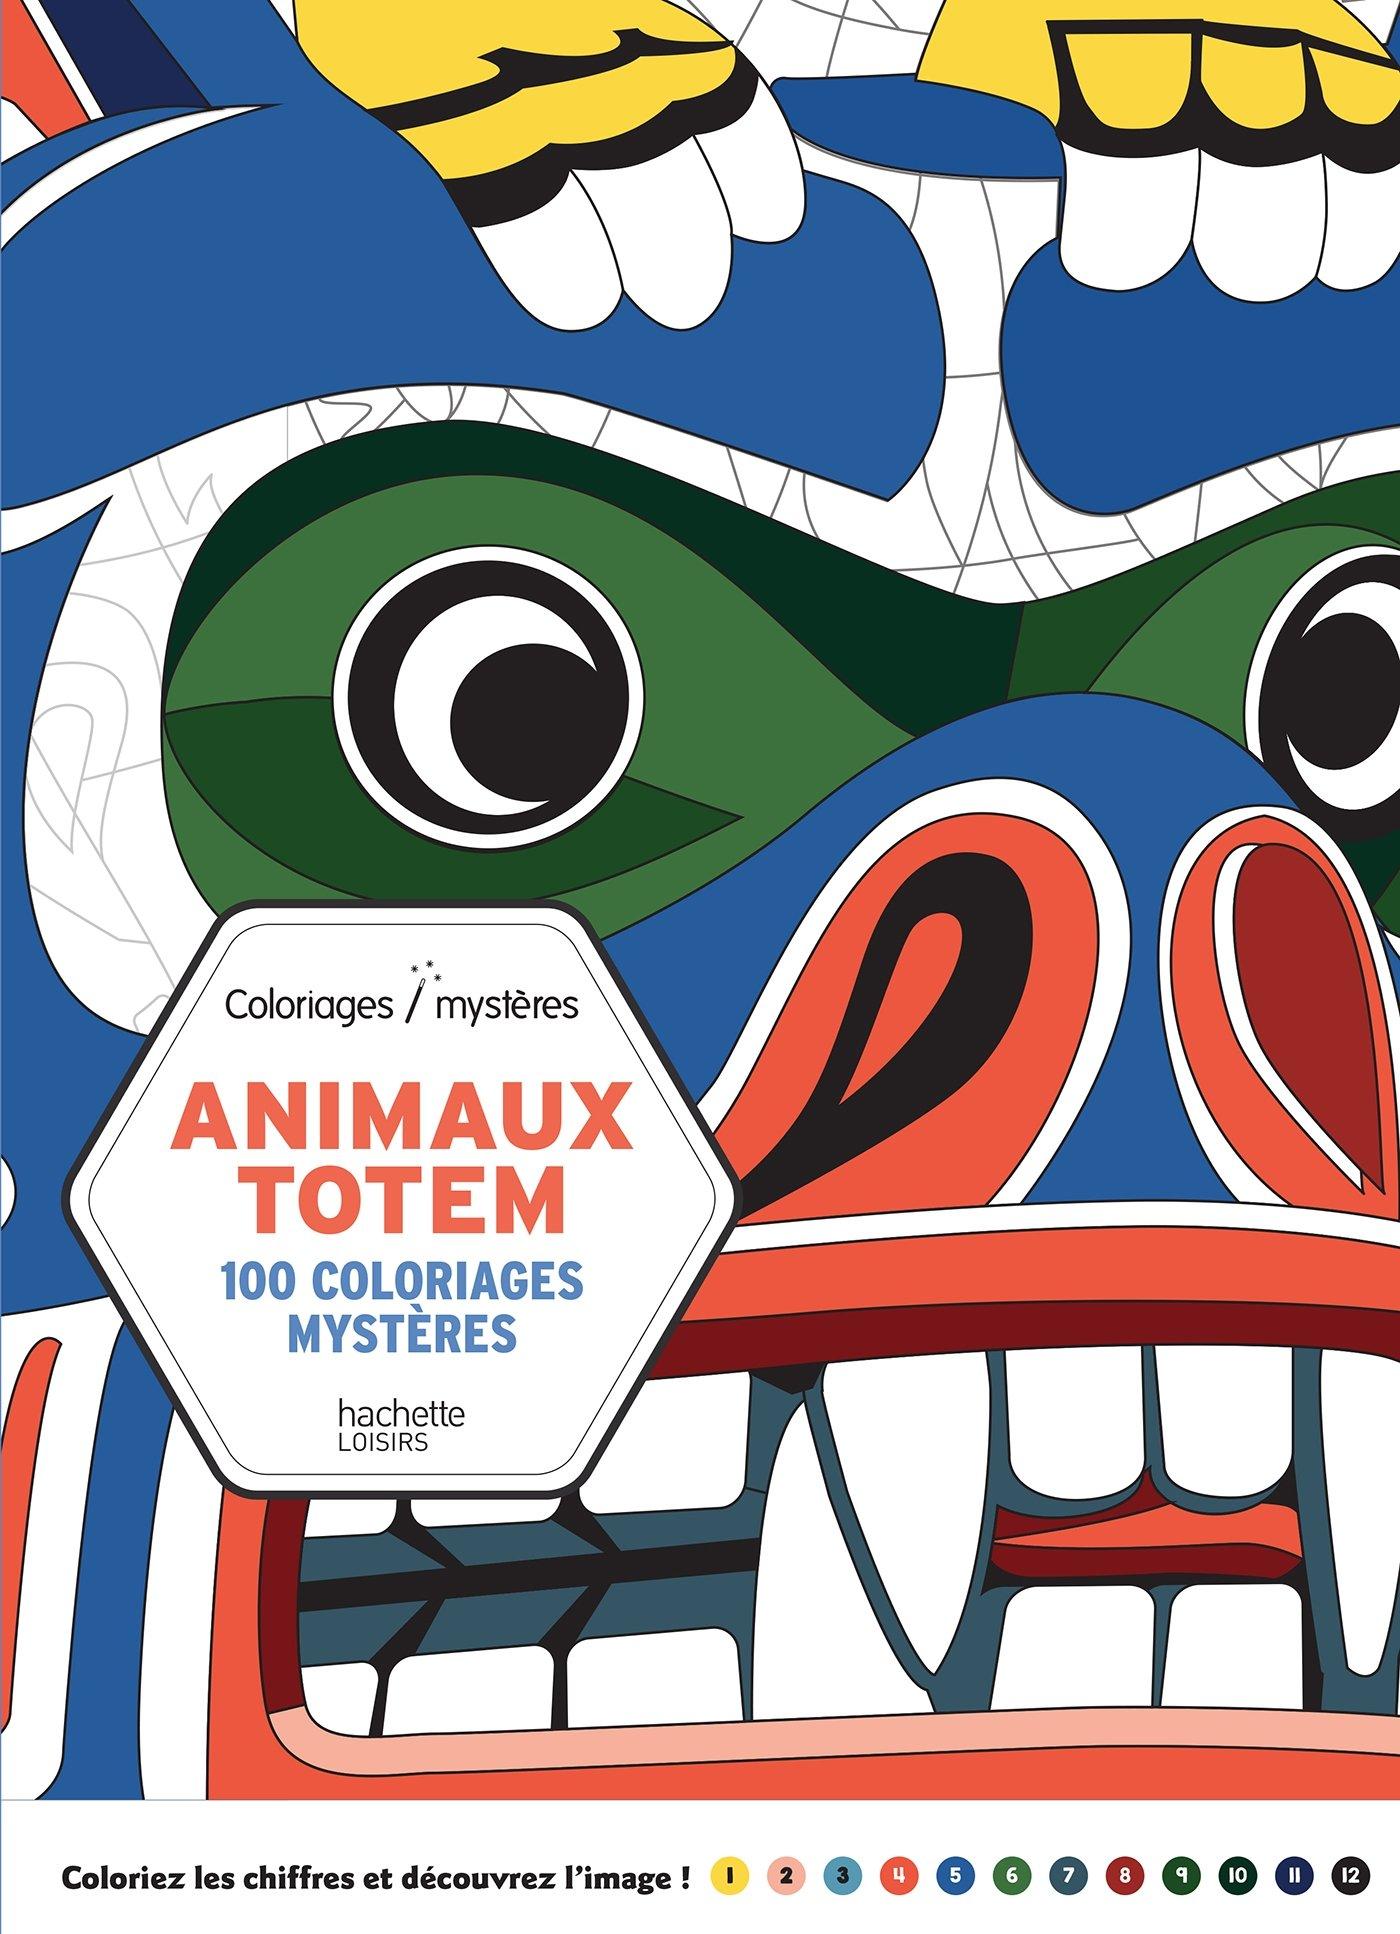 Coloriage Animaux Totem.Amazon Fr Animaux Totem Antoine Limare Livres